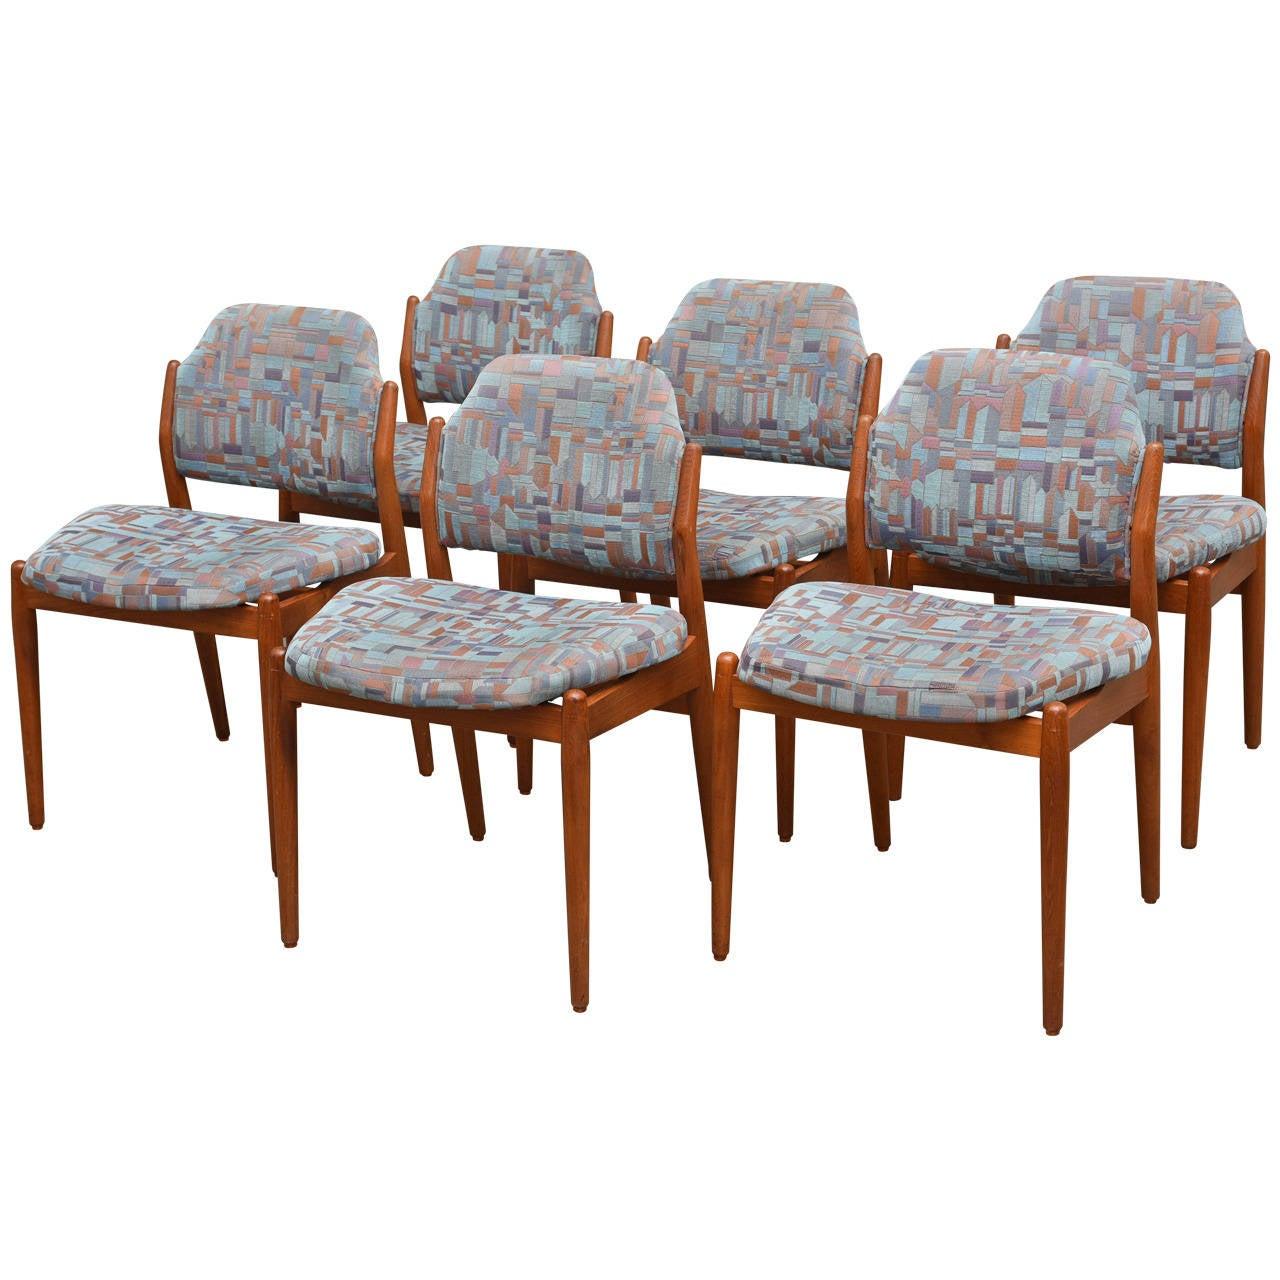 Set of Six Teak Danish Modern Dining Chairs by Arne Vodder